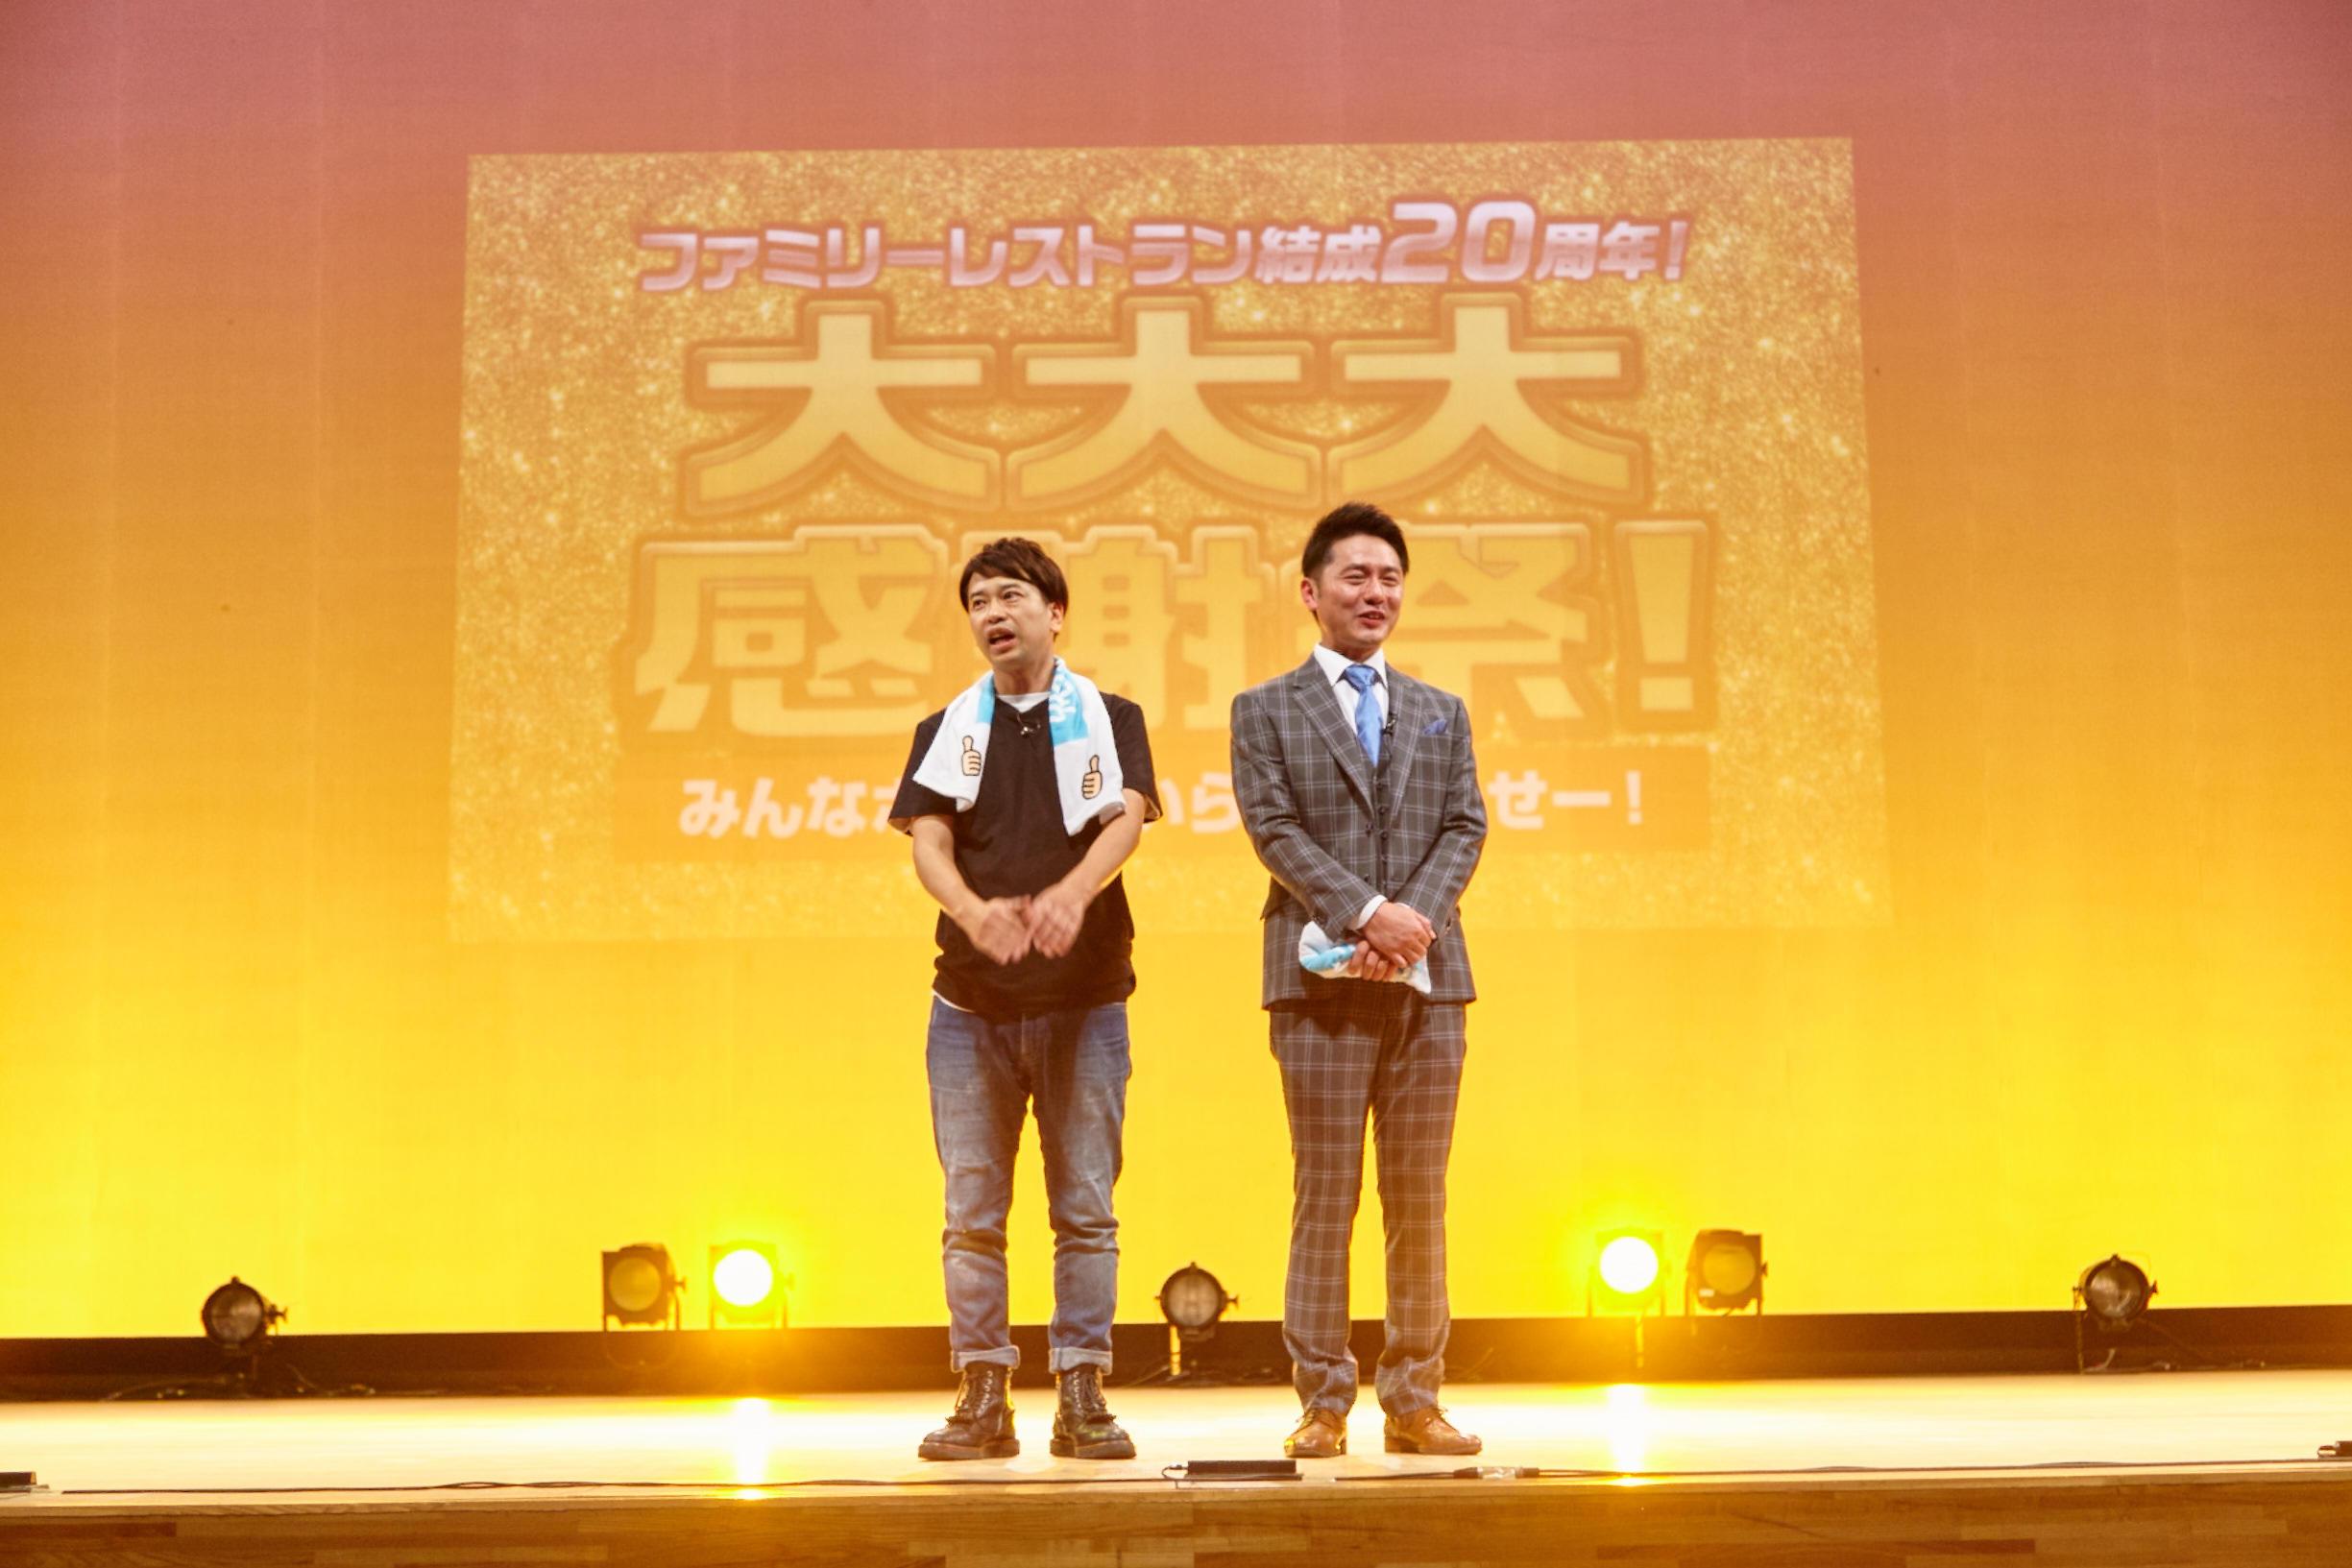 http://news.yoshimoto.co.jp/20171113162204-f55945b566054e63ed742fb23ccf970004003435.jpg